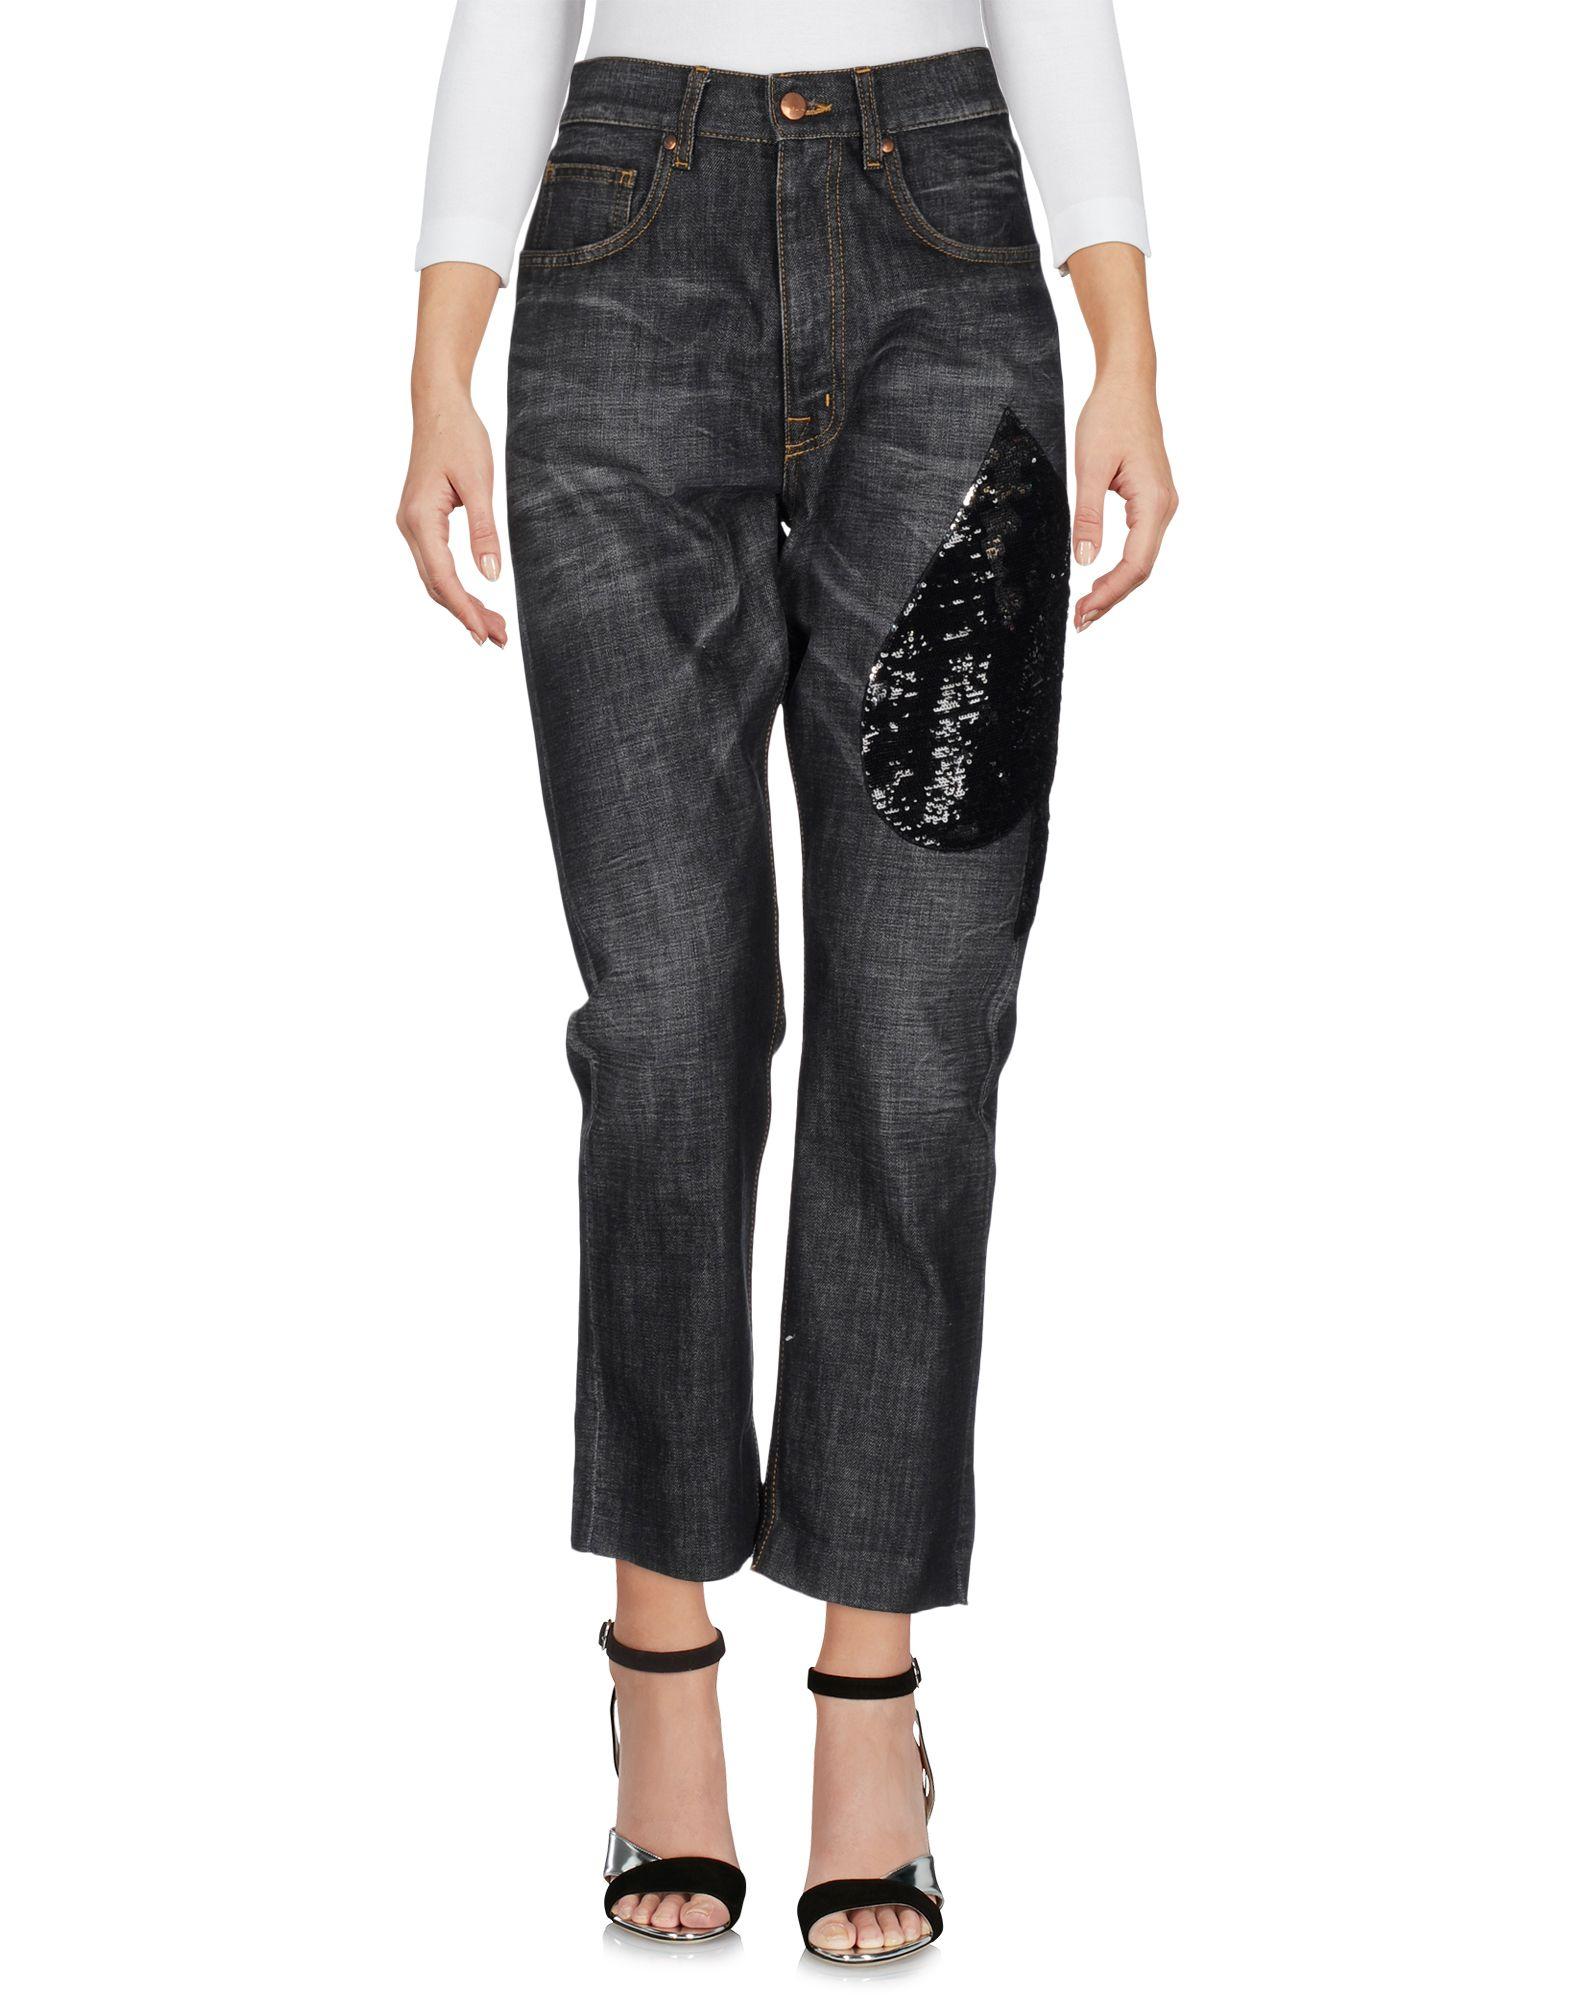 (+) PEOPLE Damen Jeanshose Farbe Schwarz Größe 4 - broschei